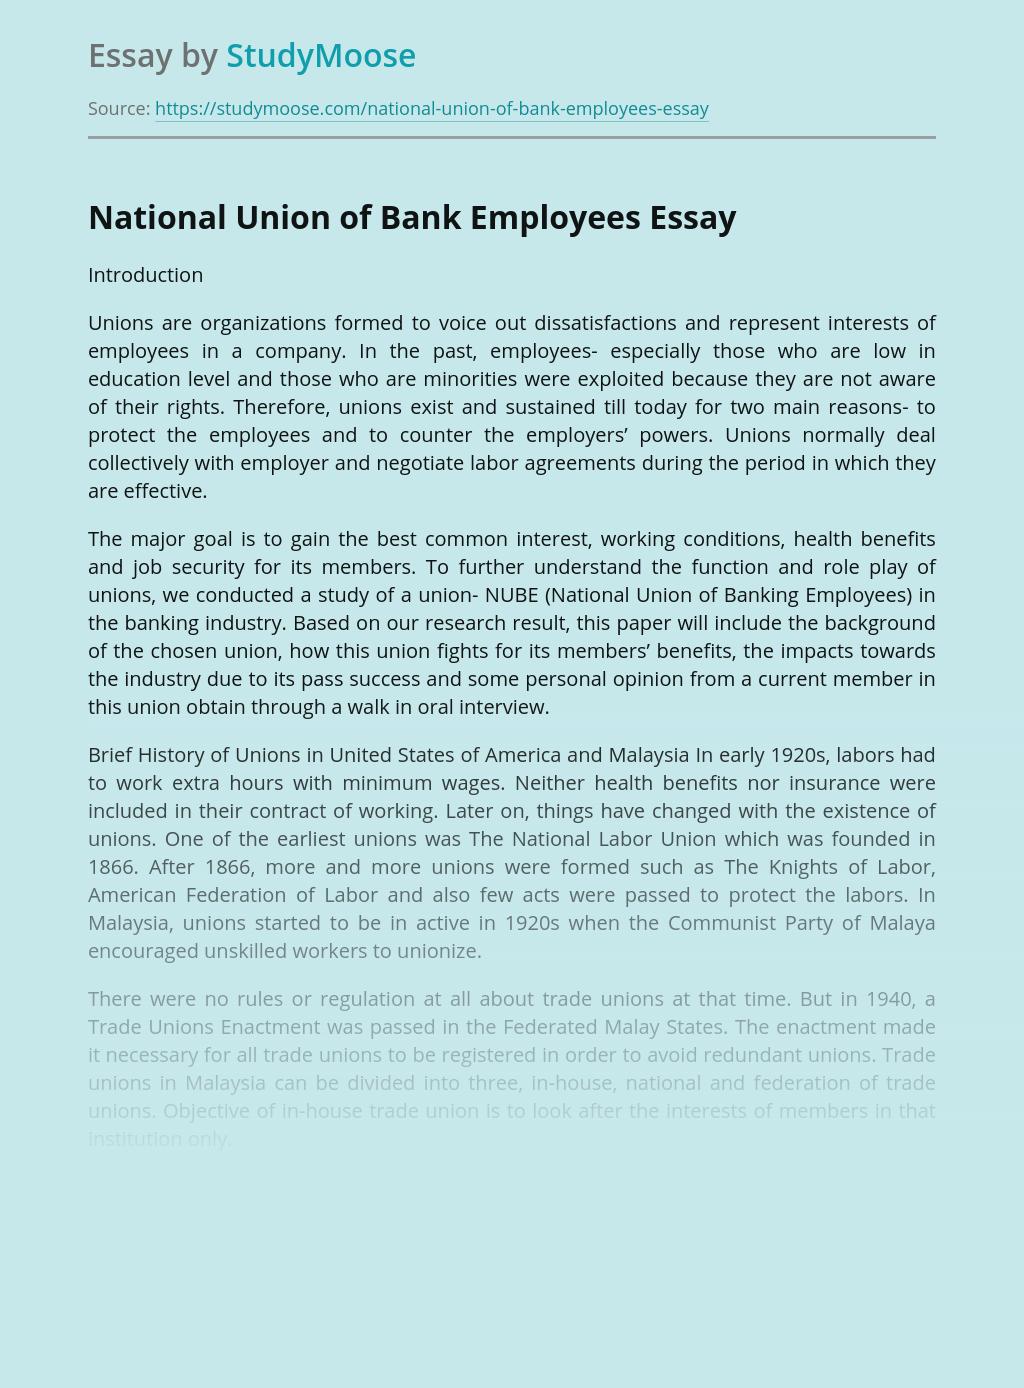 National Union of Bank Employees